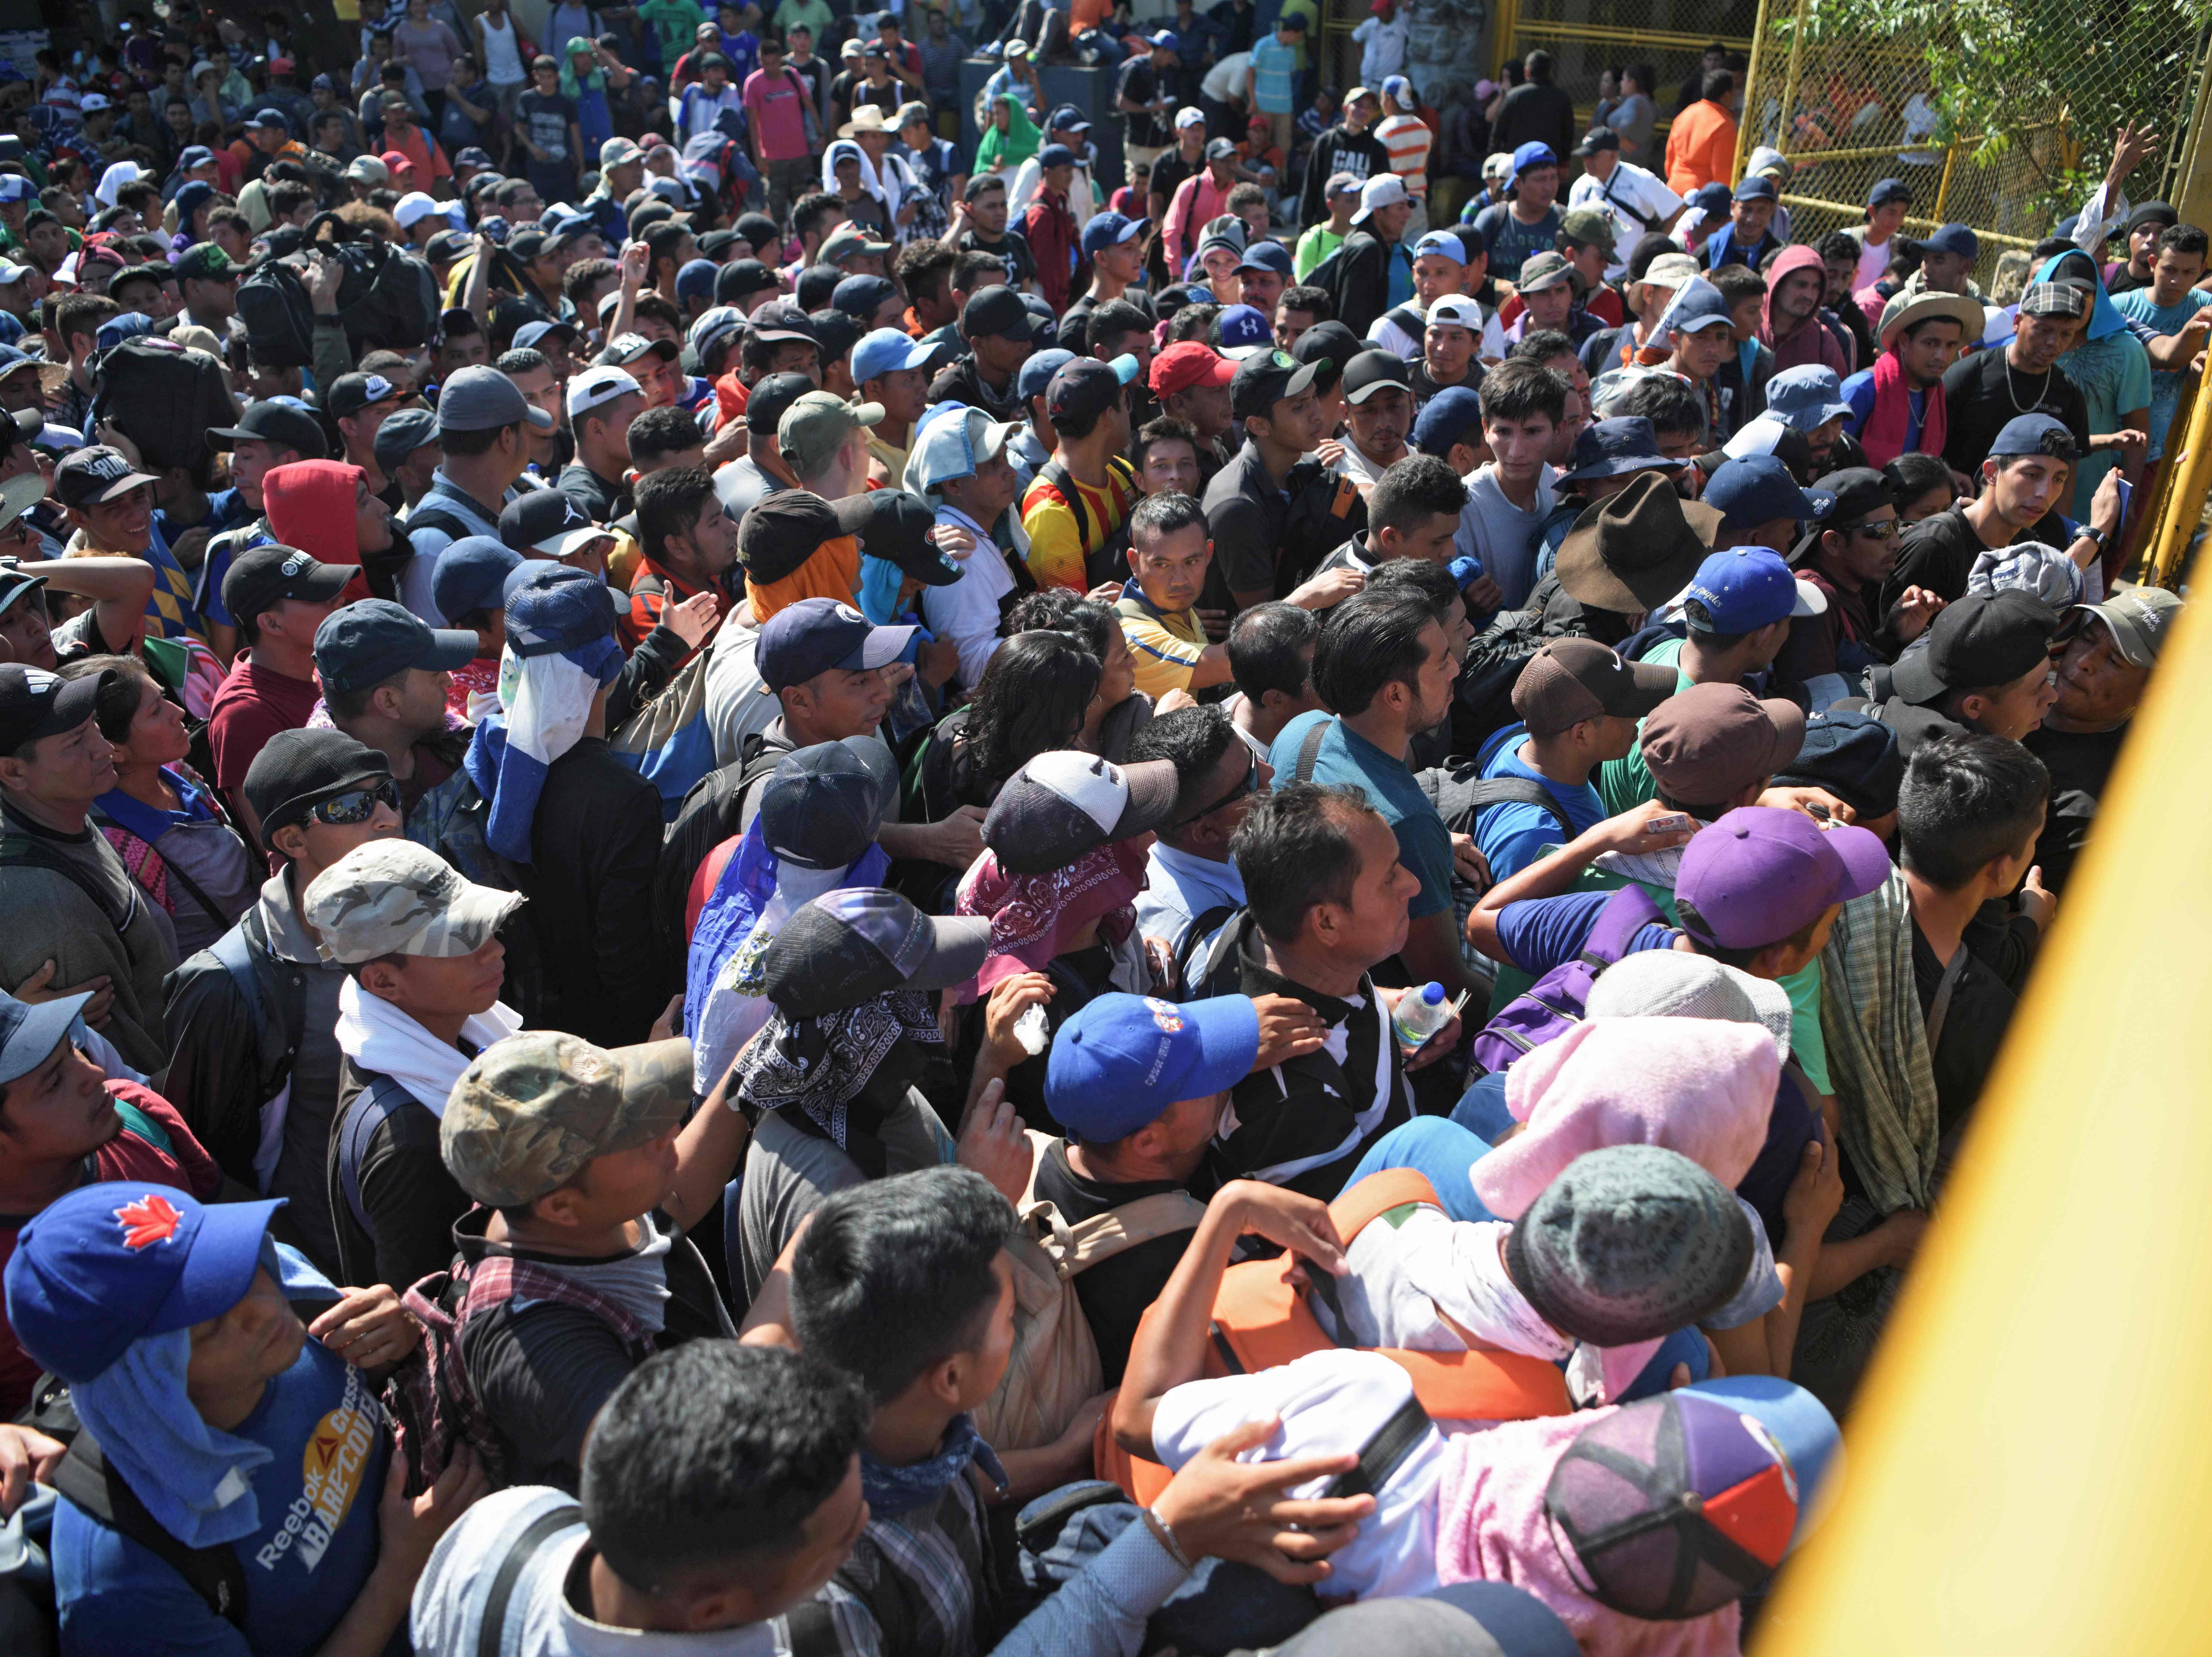 Salvadorian migrants wait to enter the Guatemala-Mexico international border bridge in Ciudad Tecun Uman, Guatemala, on Nov. 2, 2018.